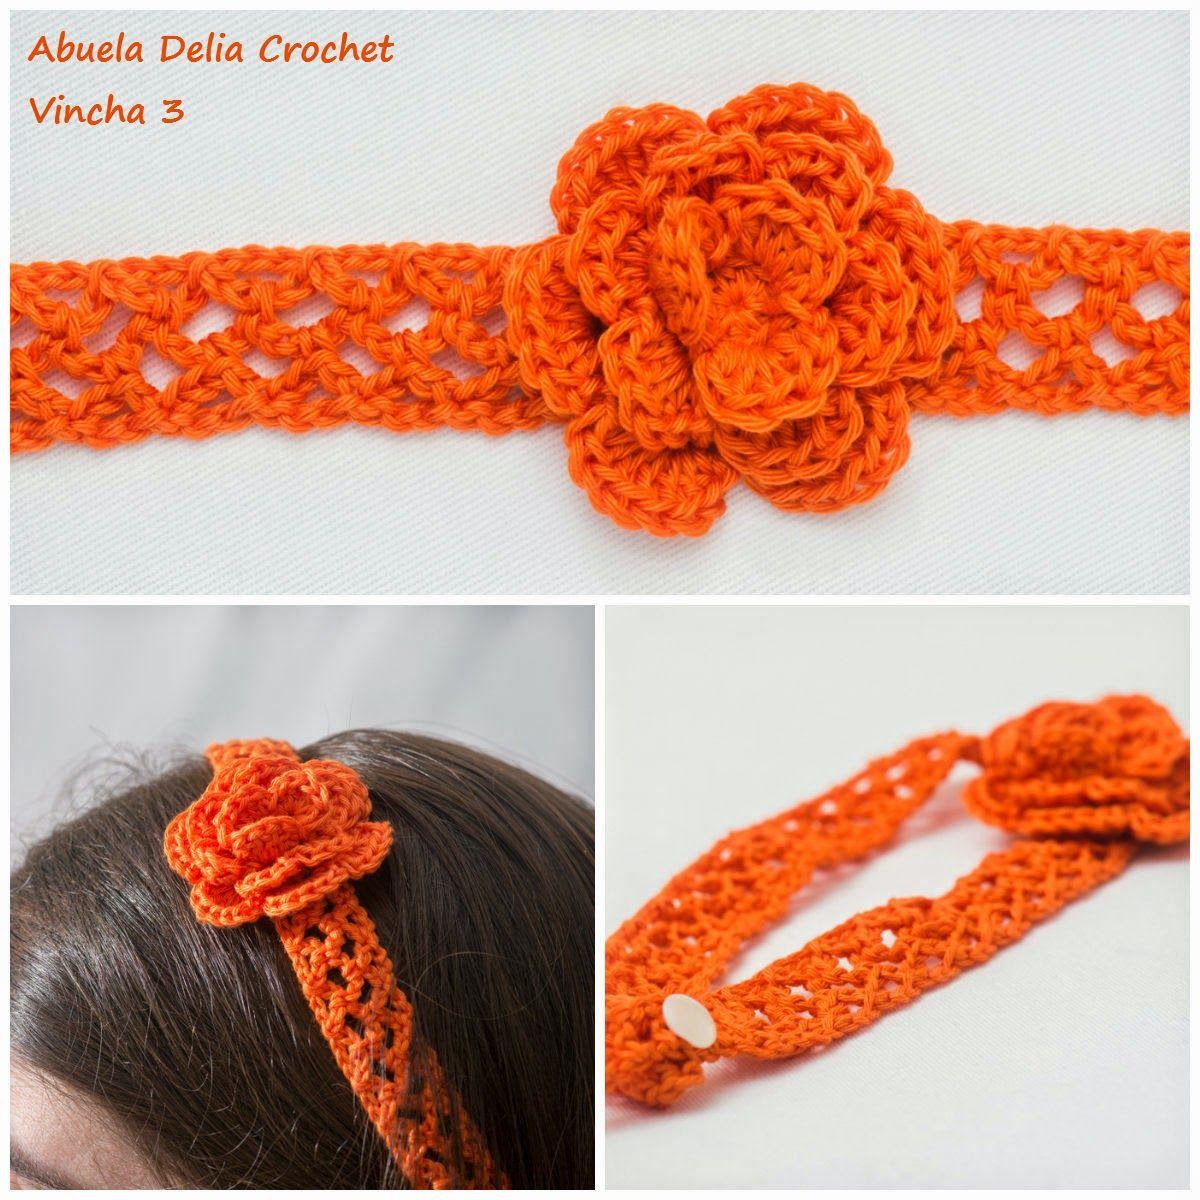 Vinchas para el cabello en Crochet | crochet | Pinterest | Croché ...